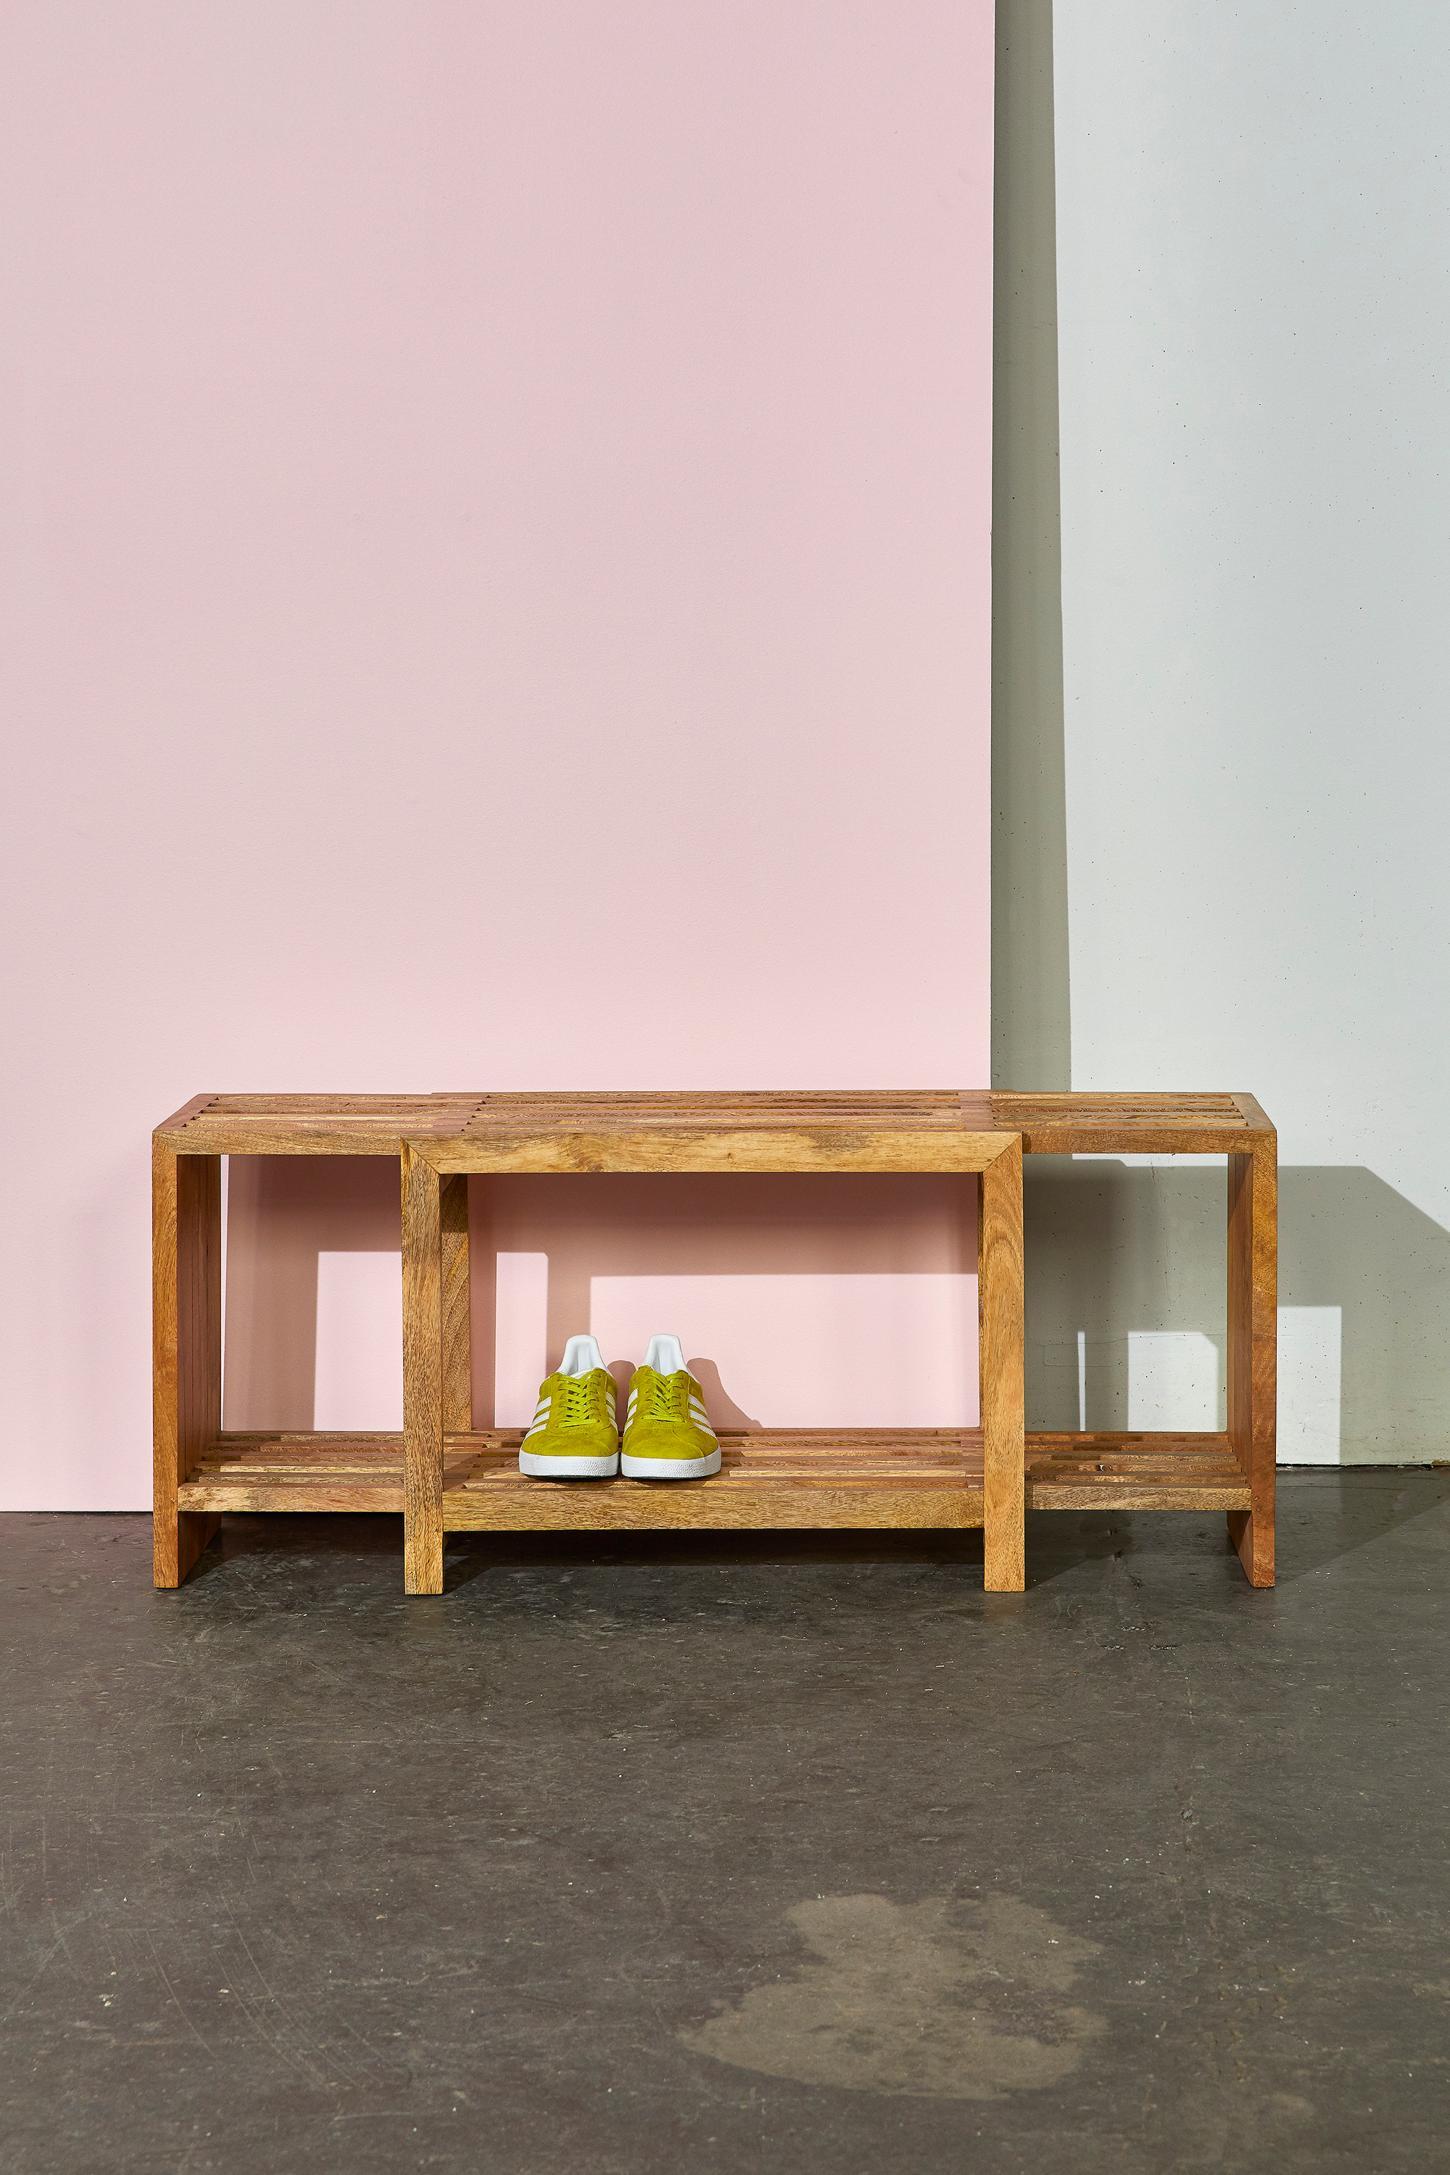 Beige Sofas & Chairs